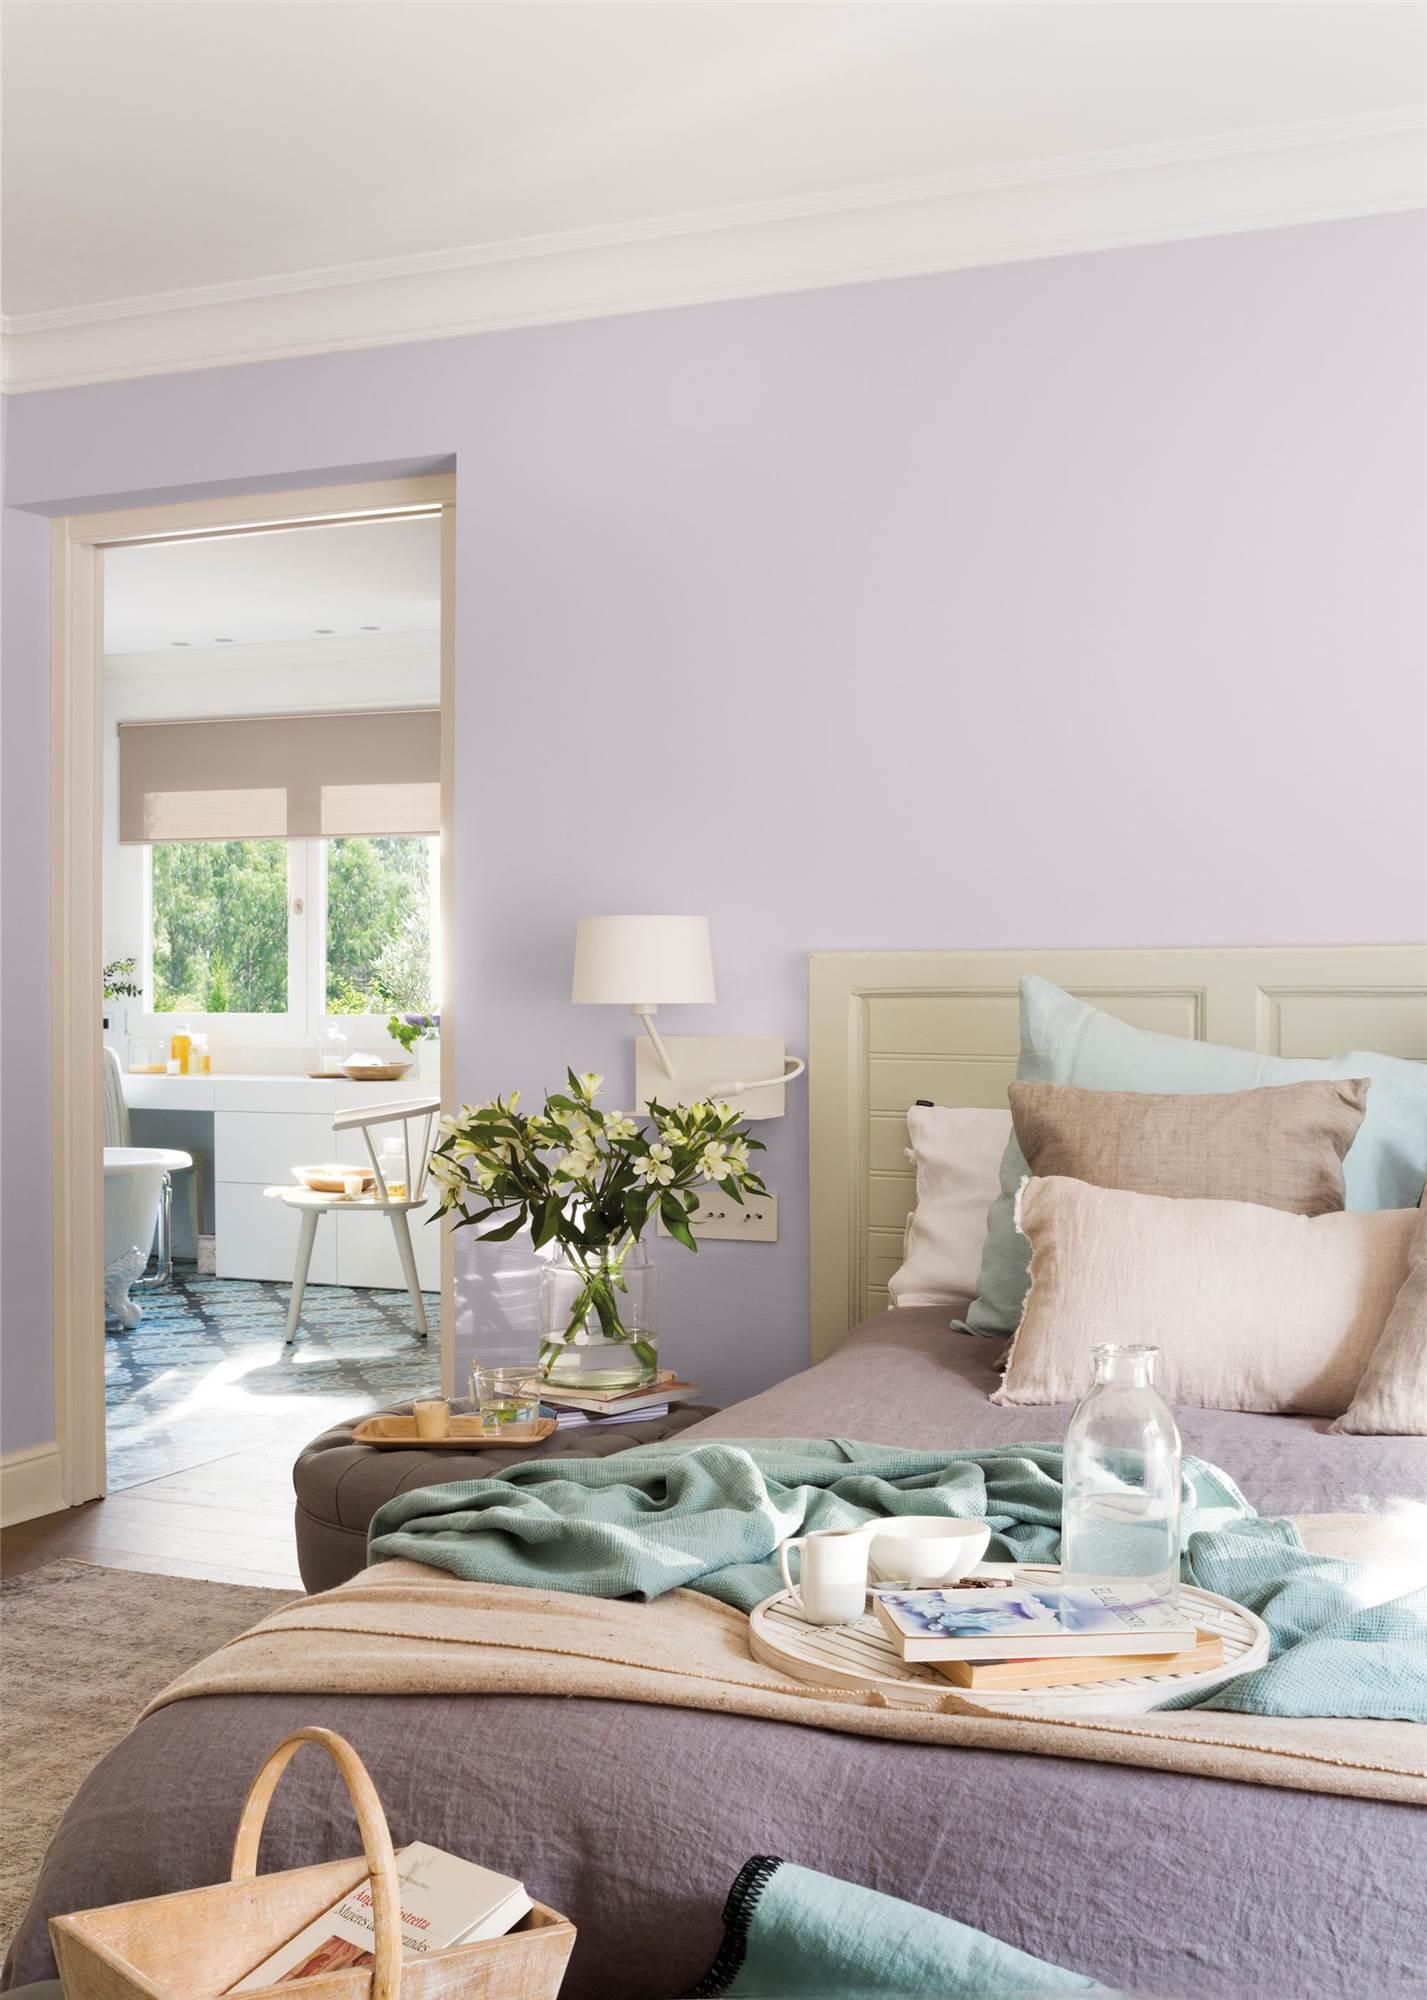 dormitorio con pared lila_ARIES-LILA-RETOQUE-VIRGIN-00454990